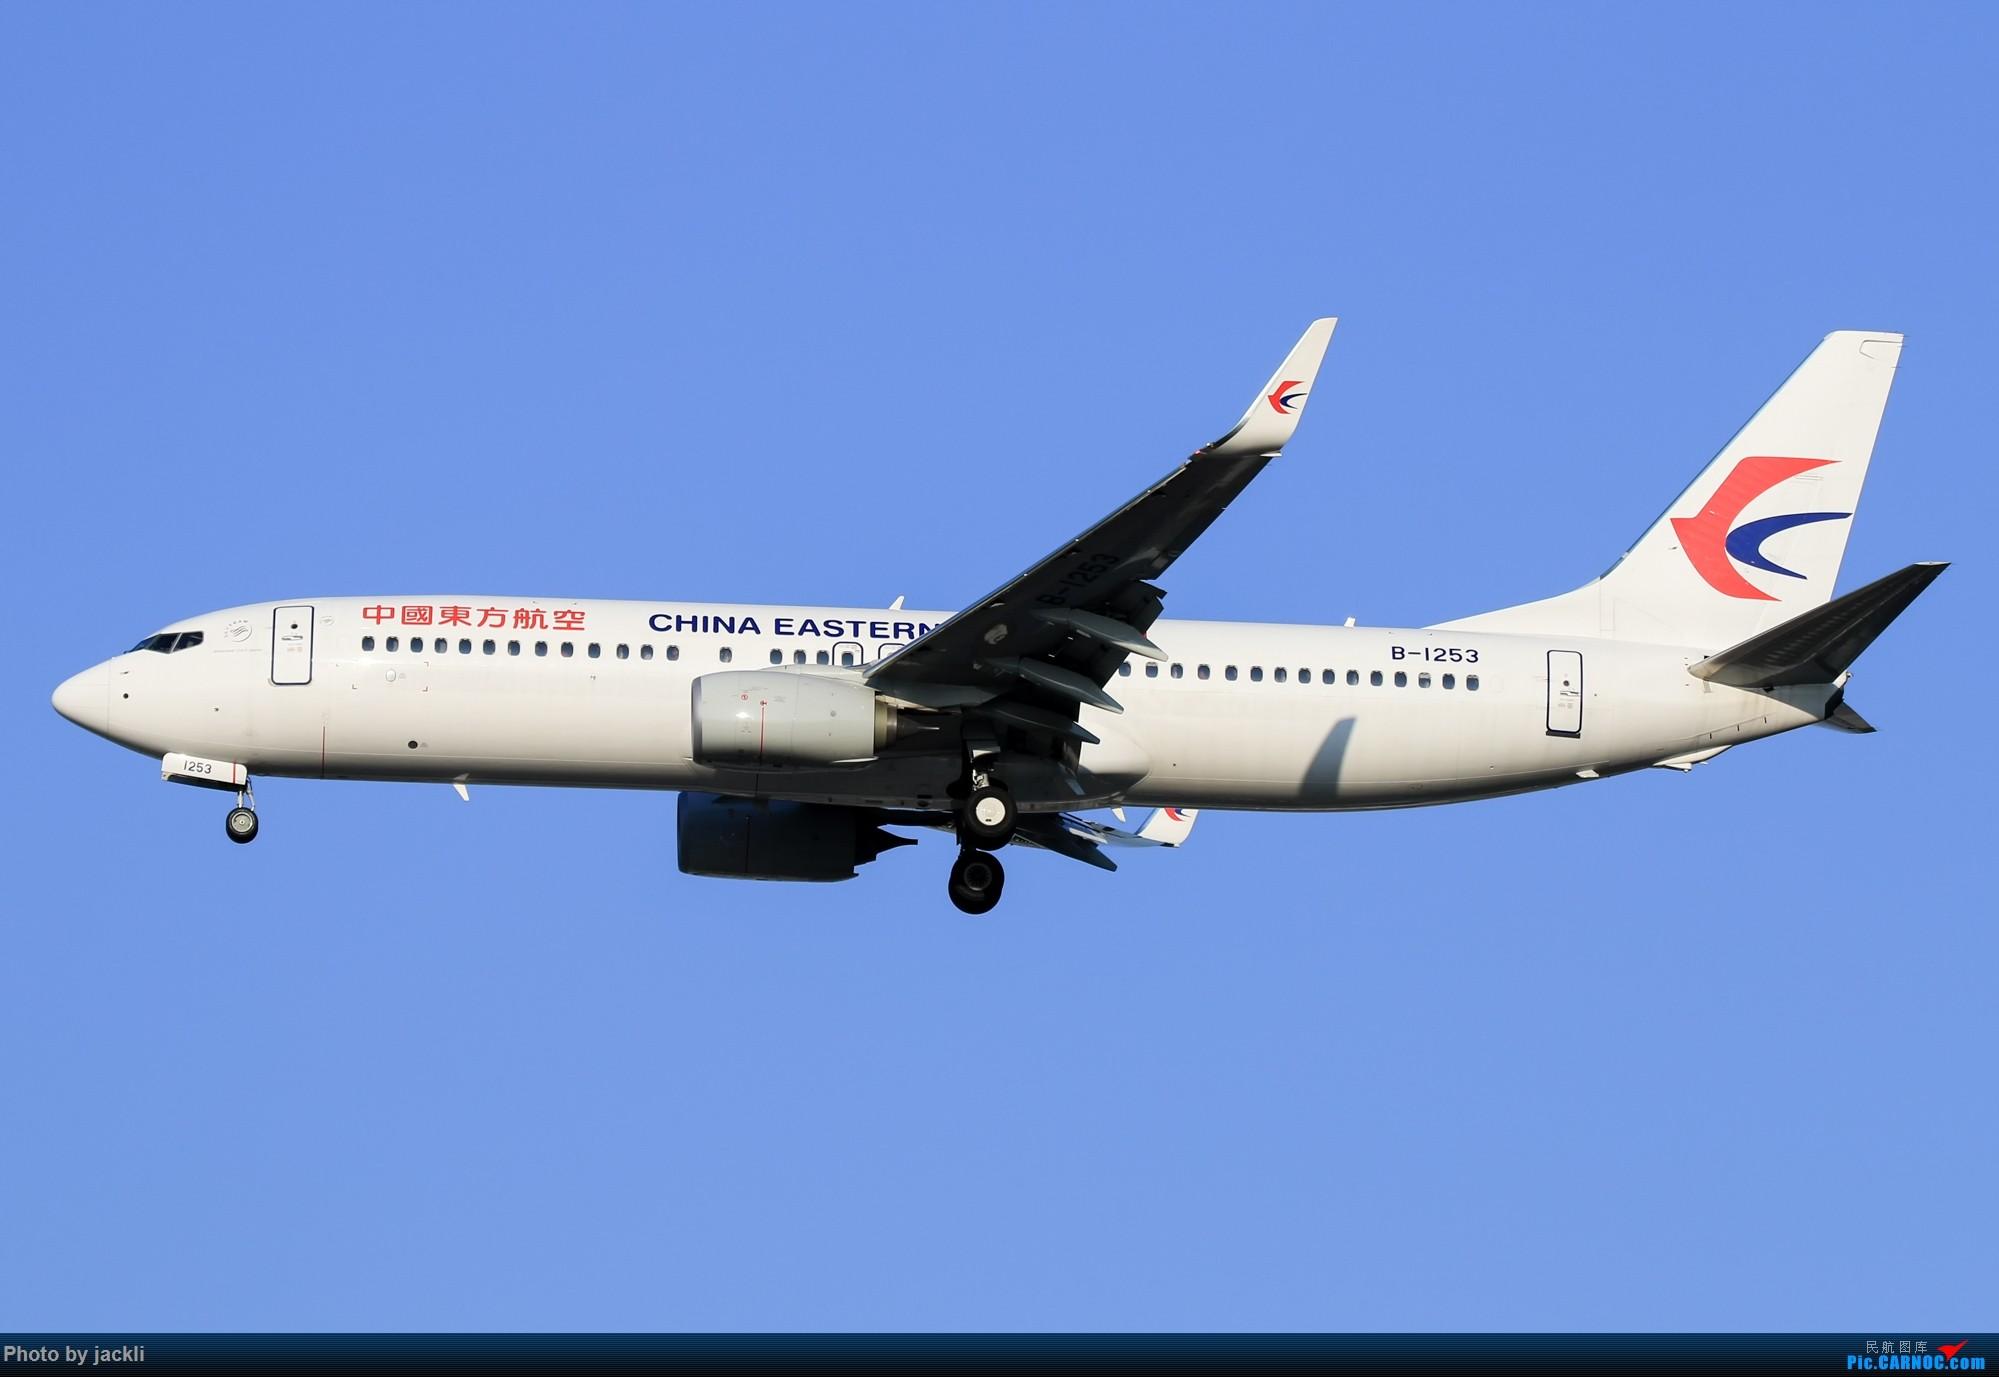 Re:[原创]【JackLi拍机+游记】北京首都机场拍机+参观民航博物馆+首次体验国航A350~ BOEING 737-800 B-1253 中国北京首都国际机场